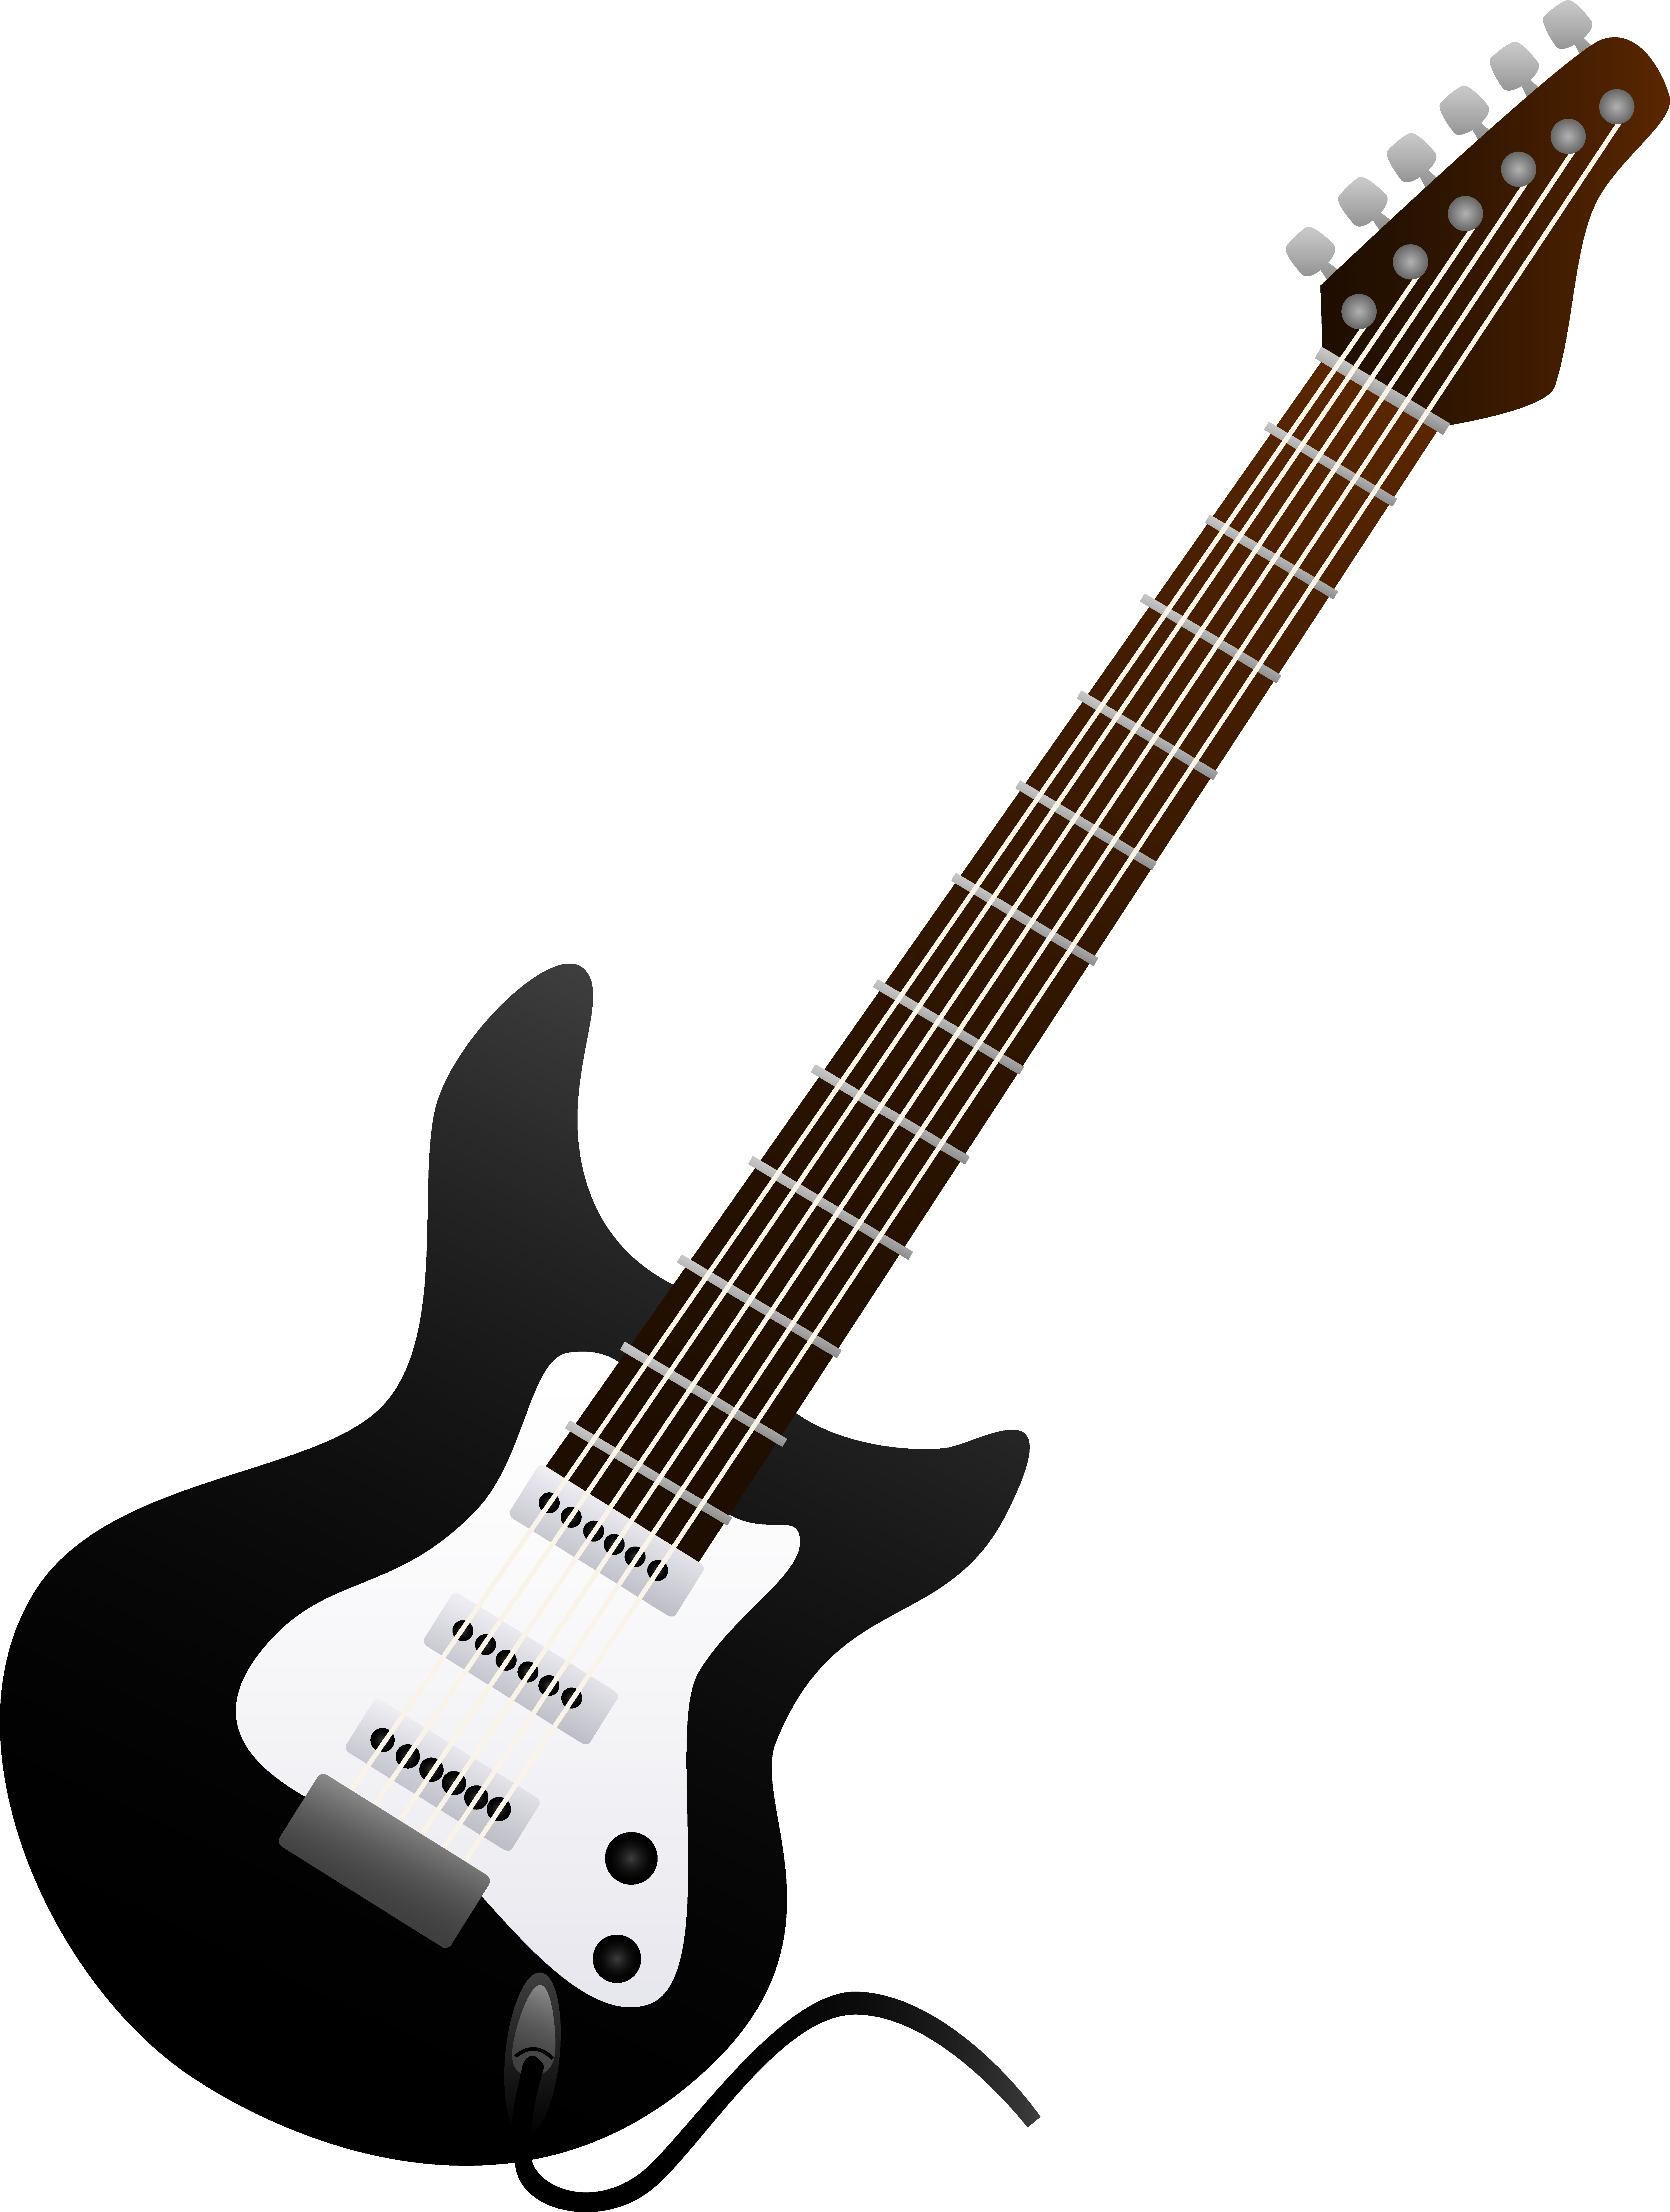 5971x7908 Black Electric Guitar Design